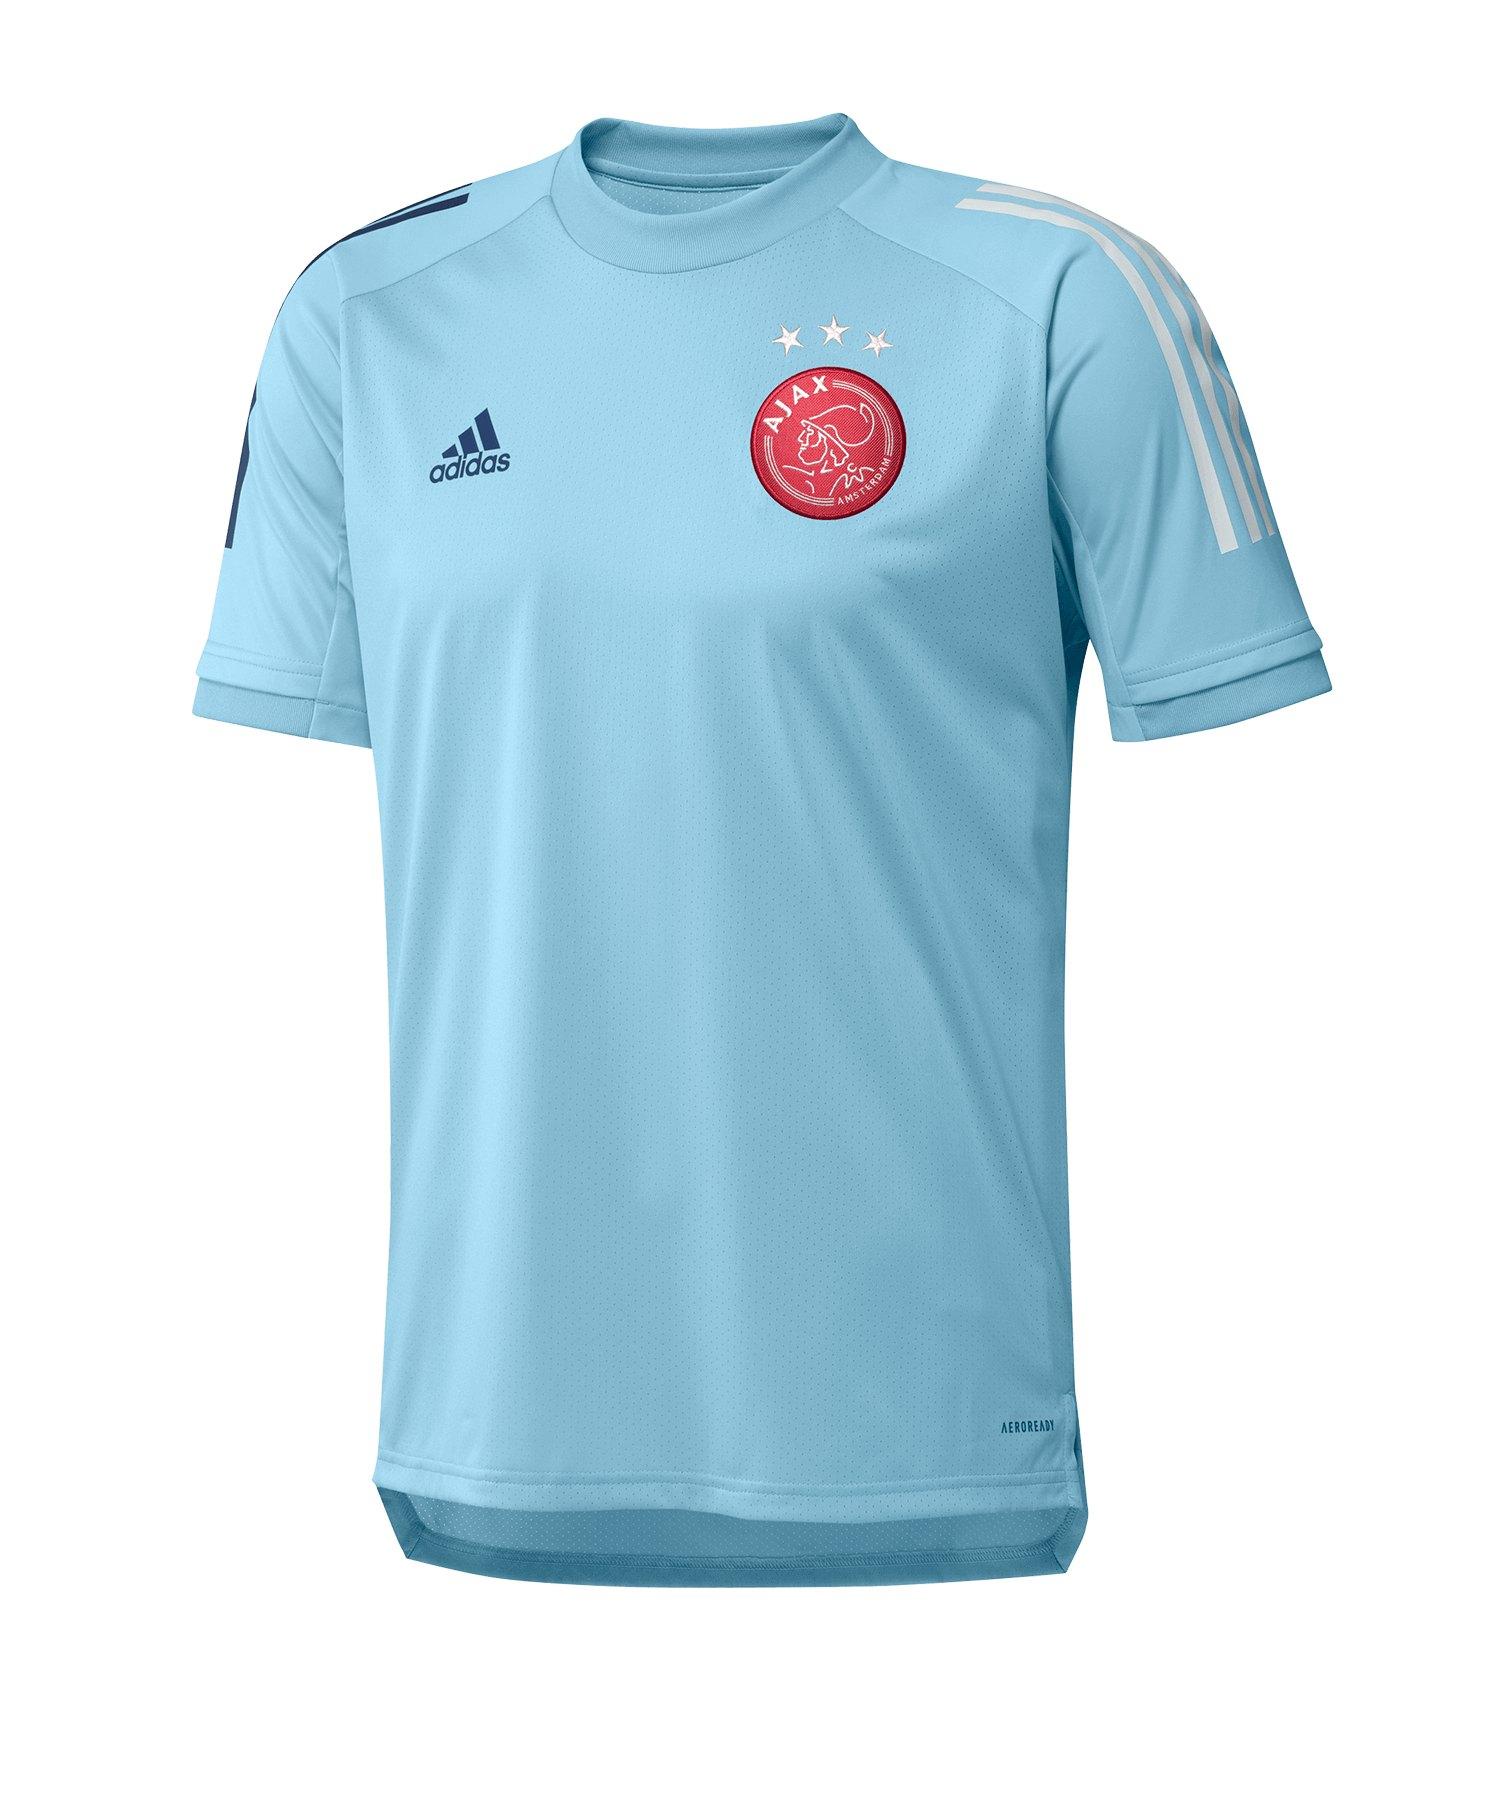 adidas Ajax Amsterdam Trainingsshirt kurzarm Blau - blau